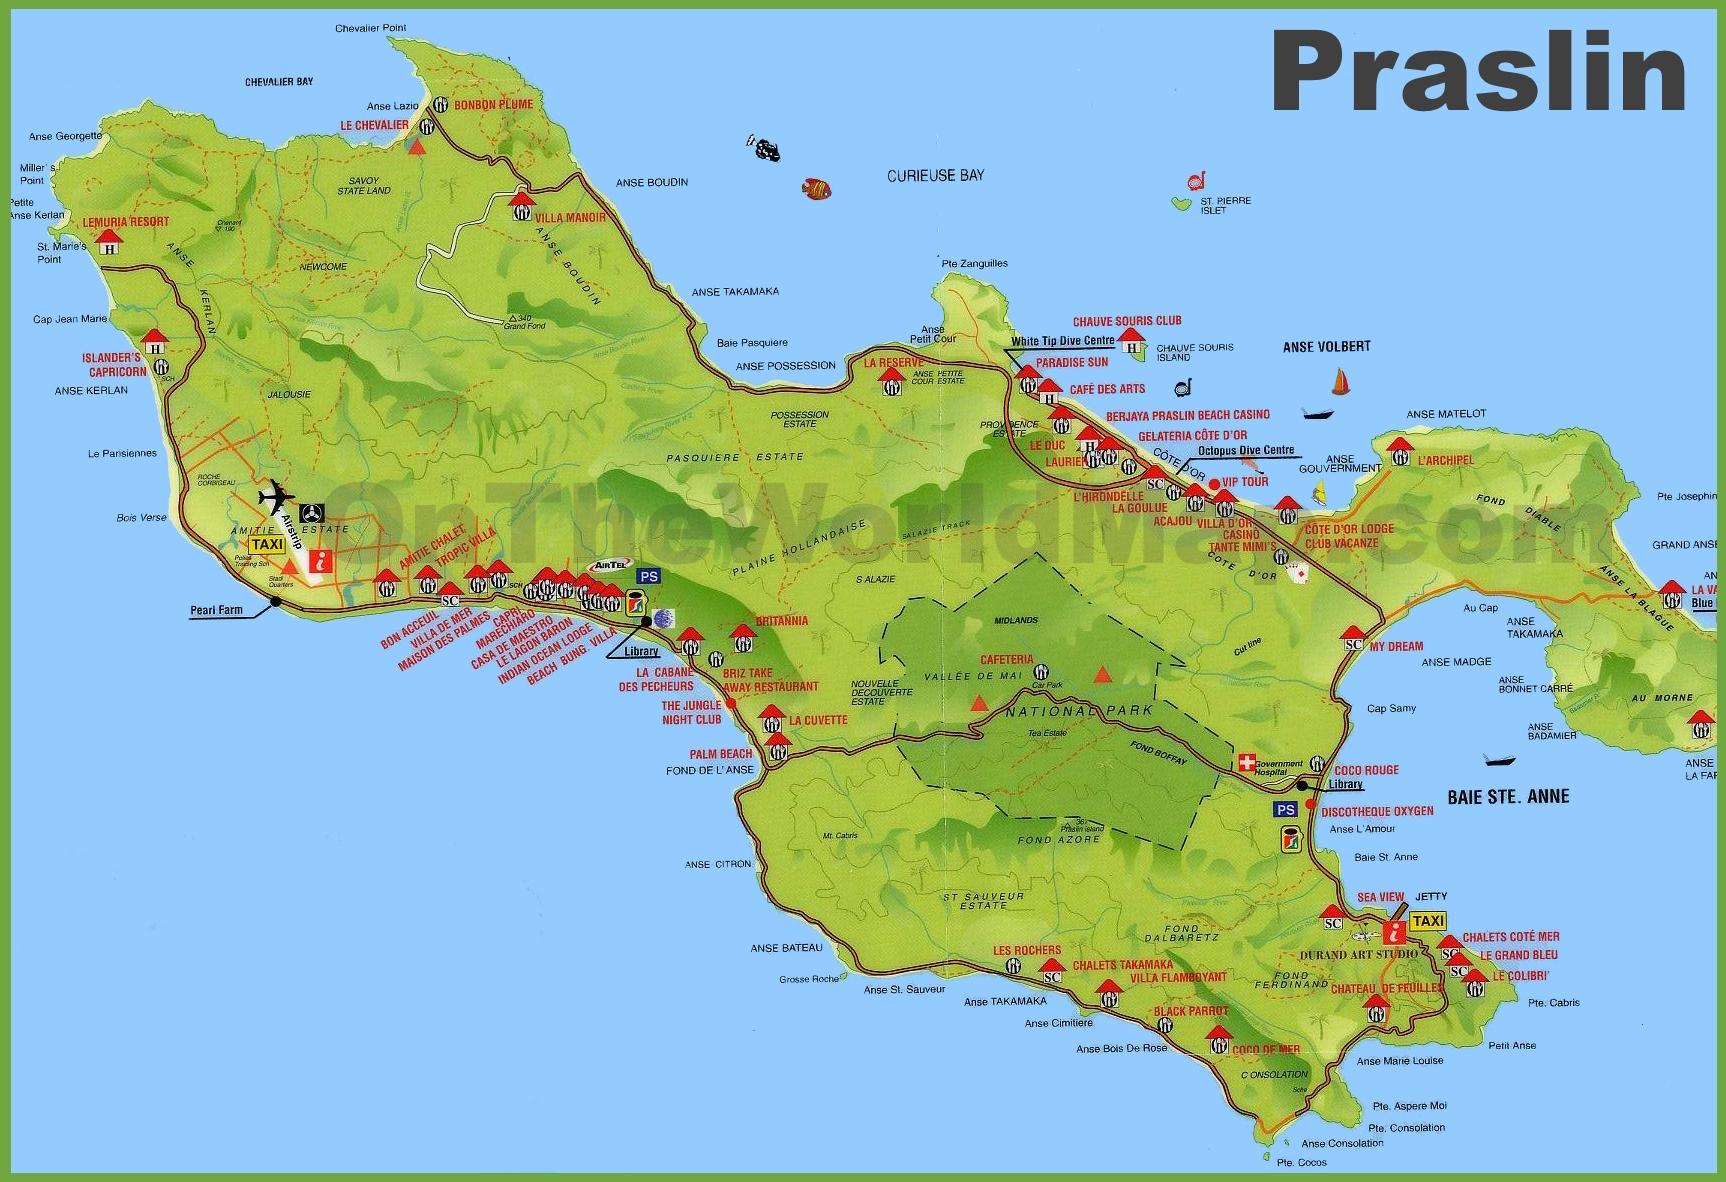 Praslin Island Seychelles World Map Praslin island map